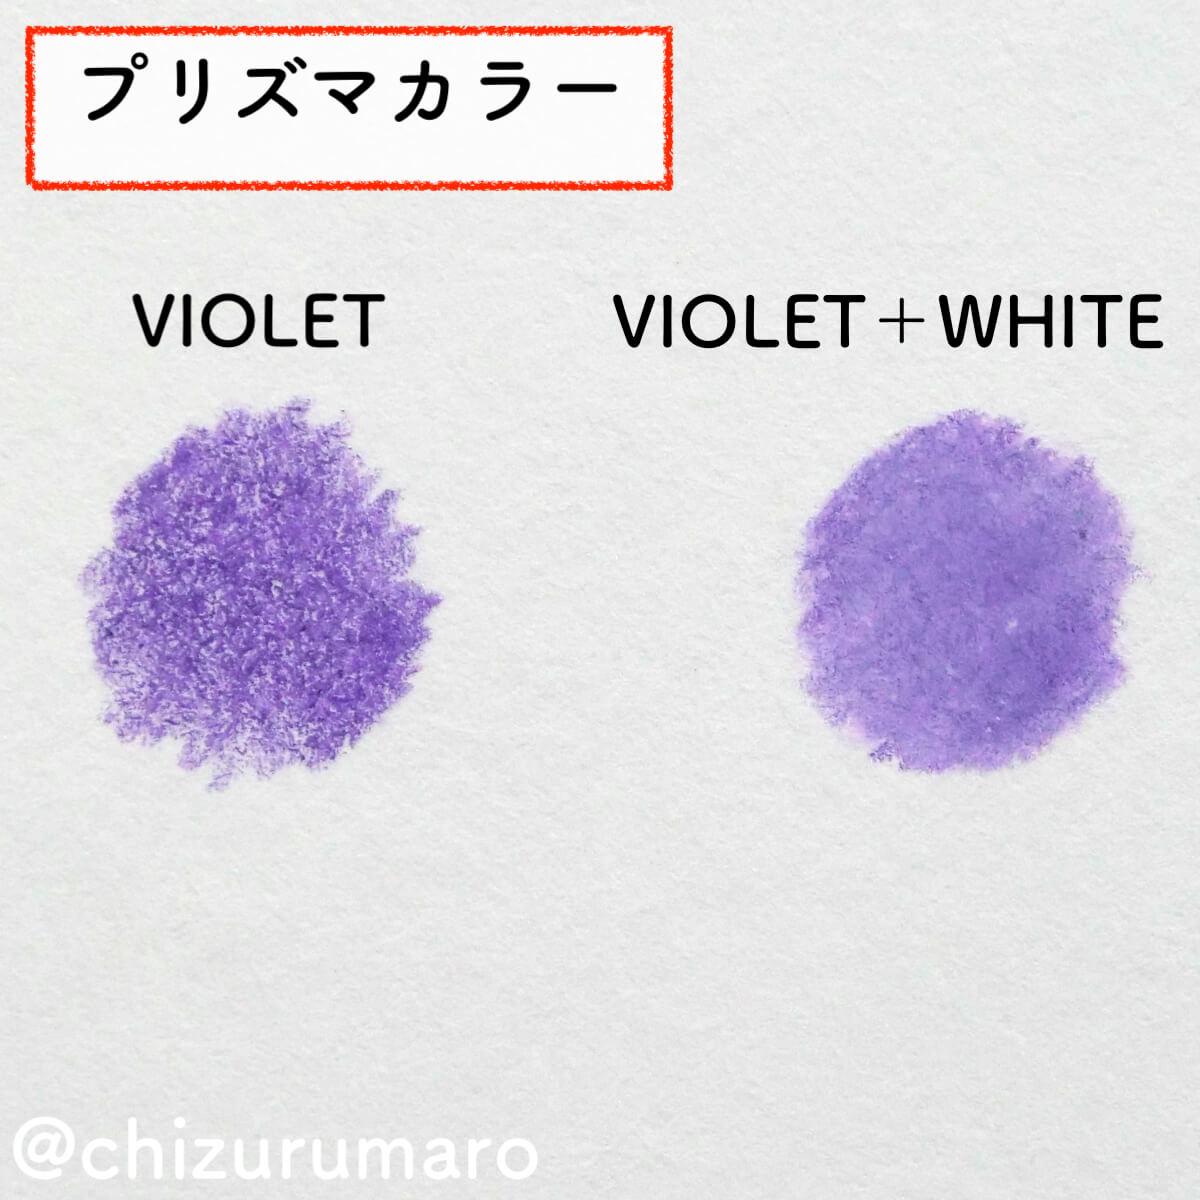 f:id:chizurumaro:20210805135100j:plain